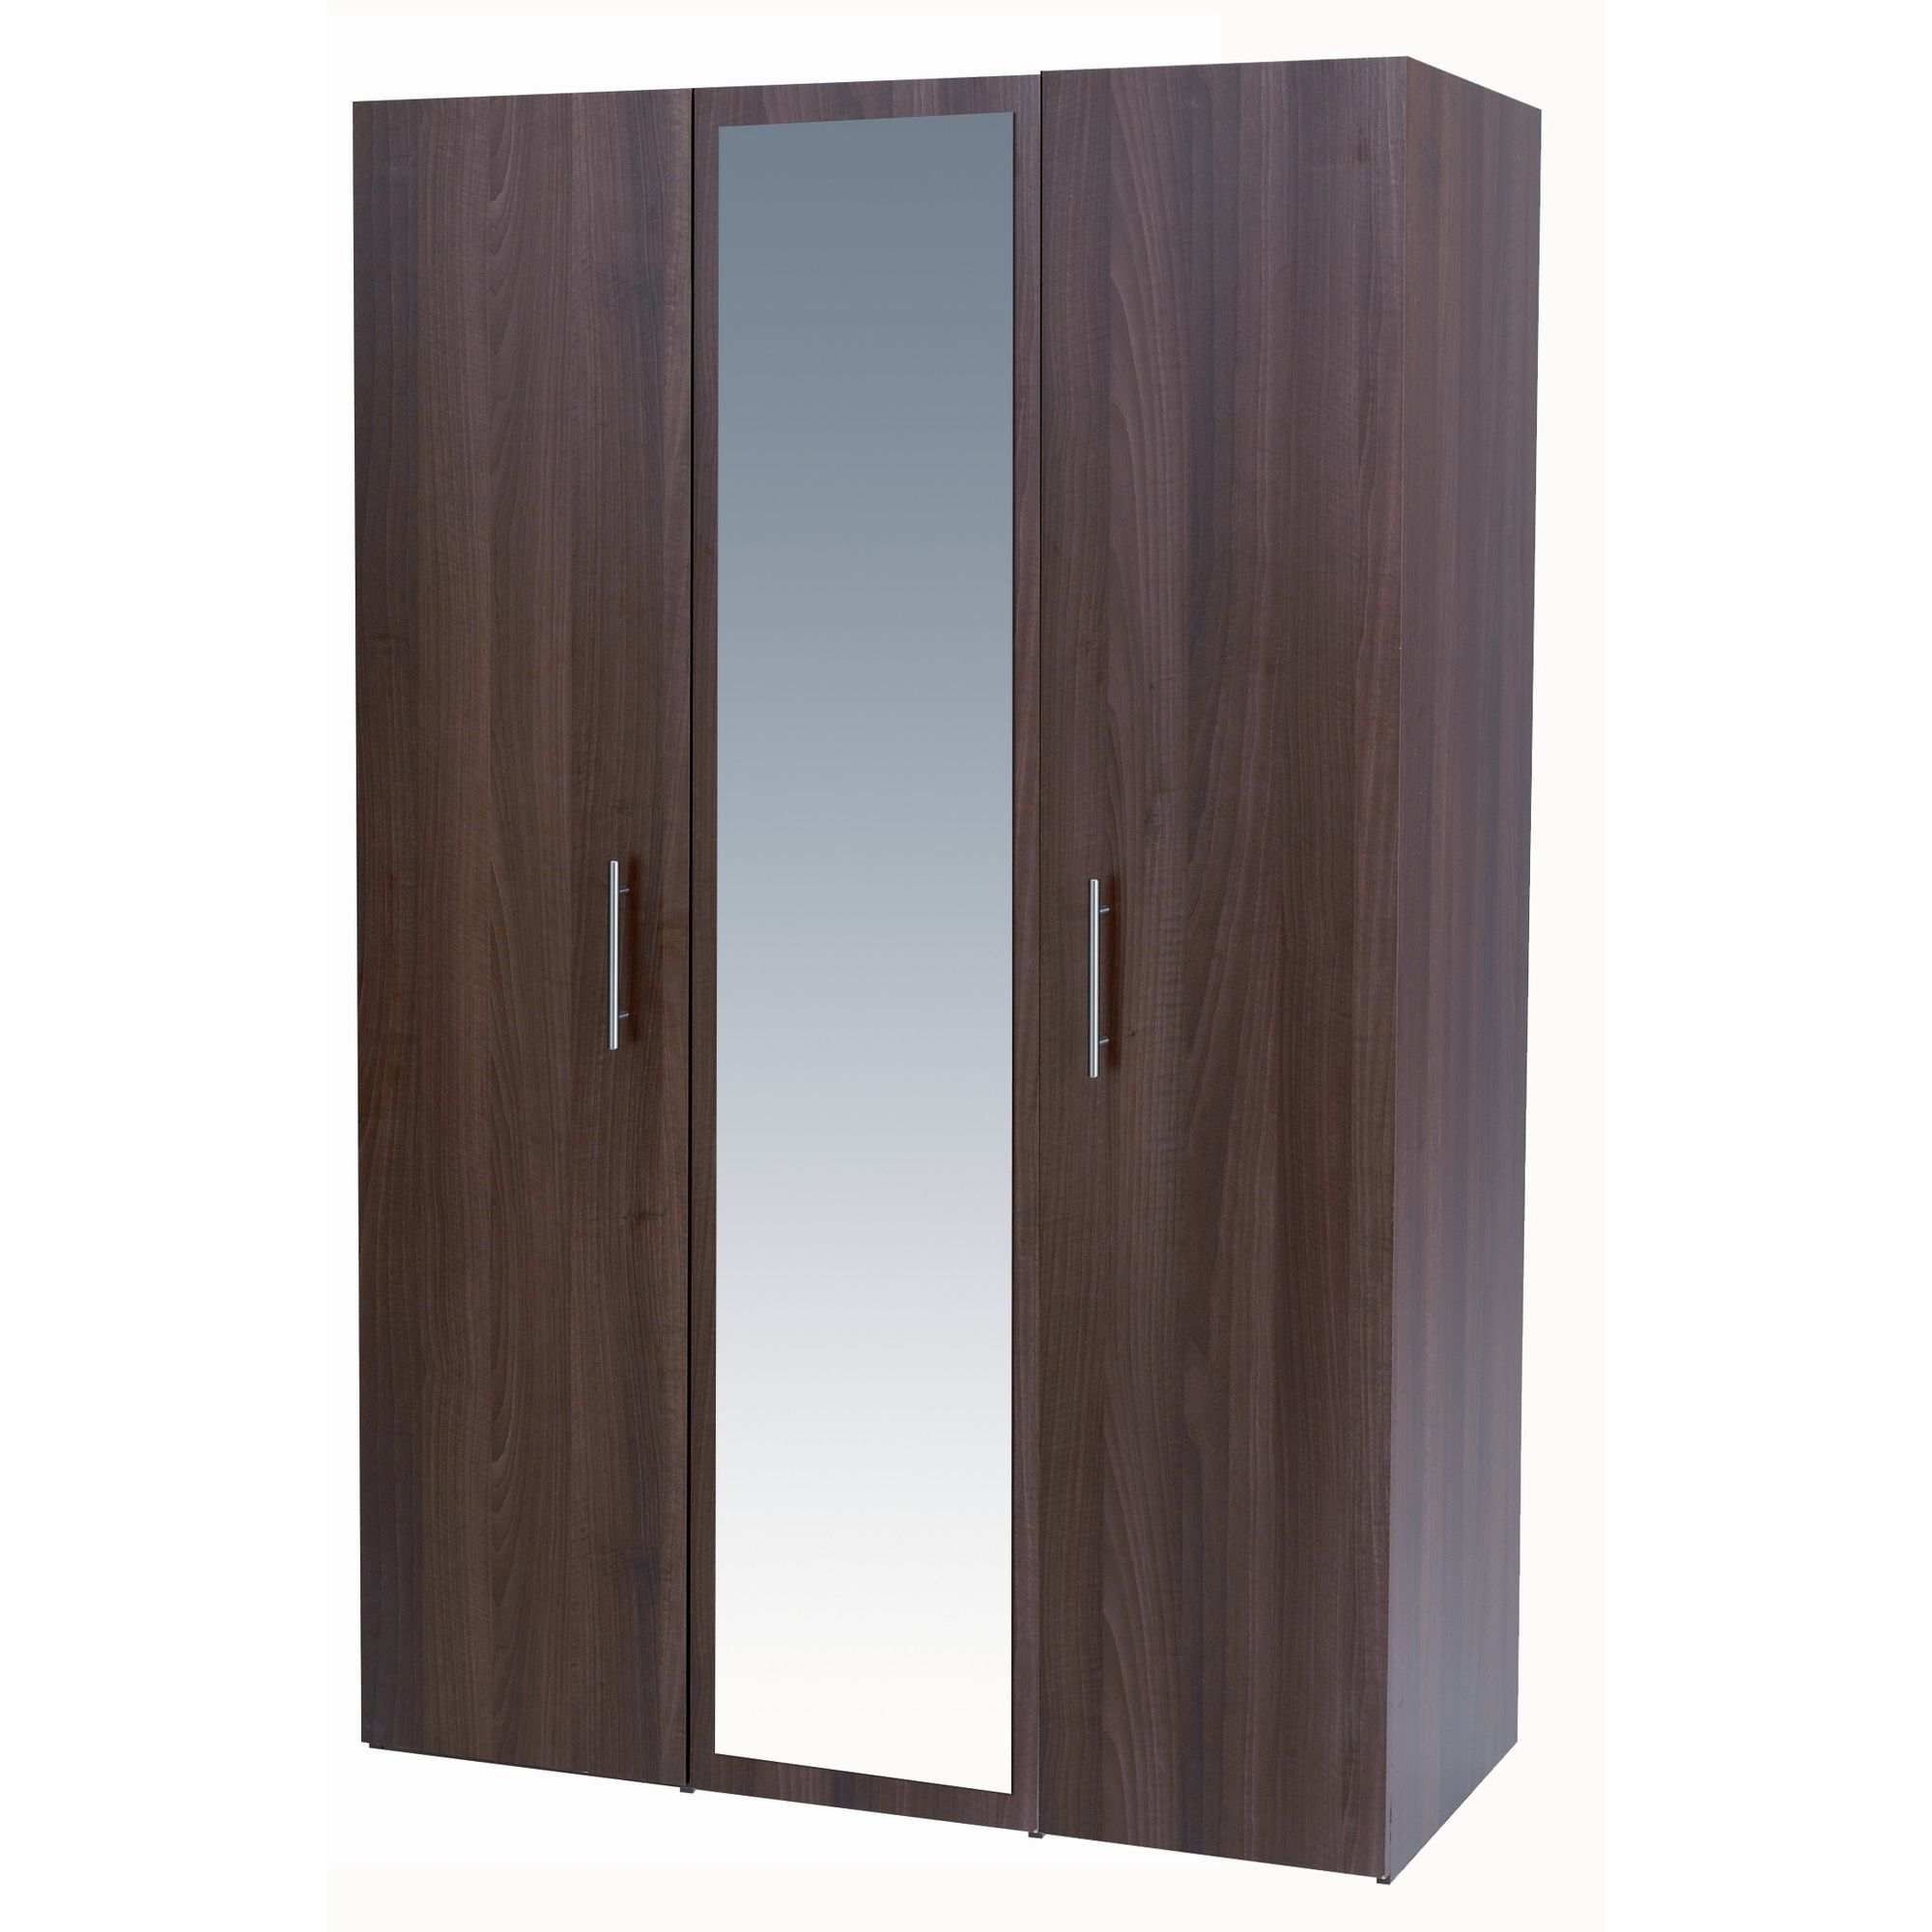 Alto Furniture Mode Three Door Wardrobe in Walnut at Tesco Direct